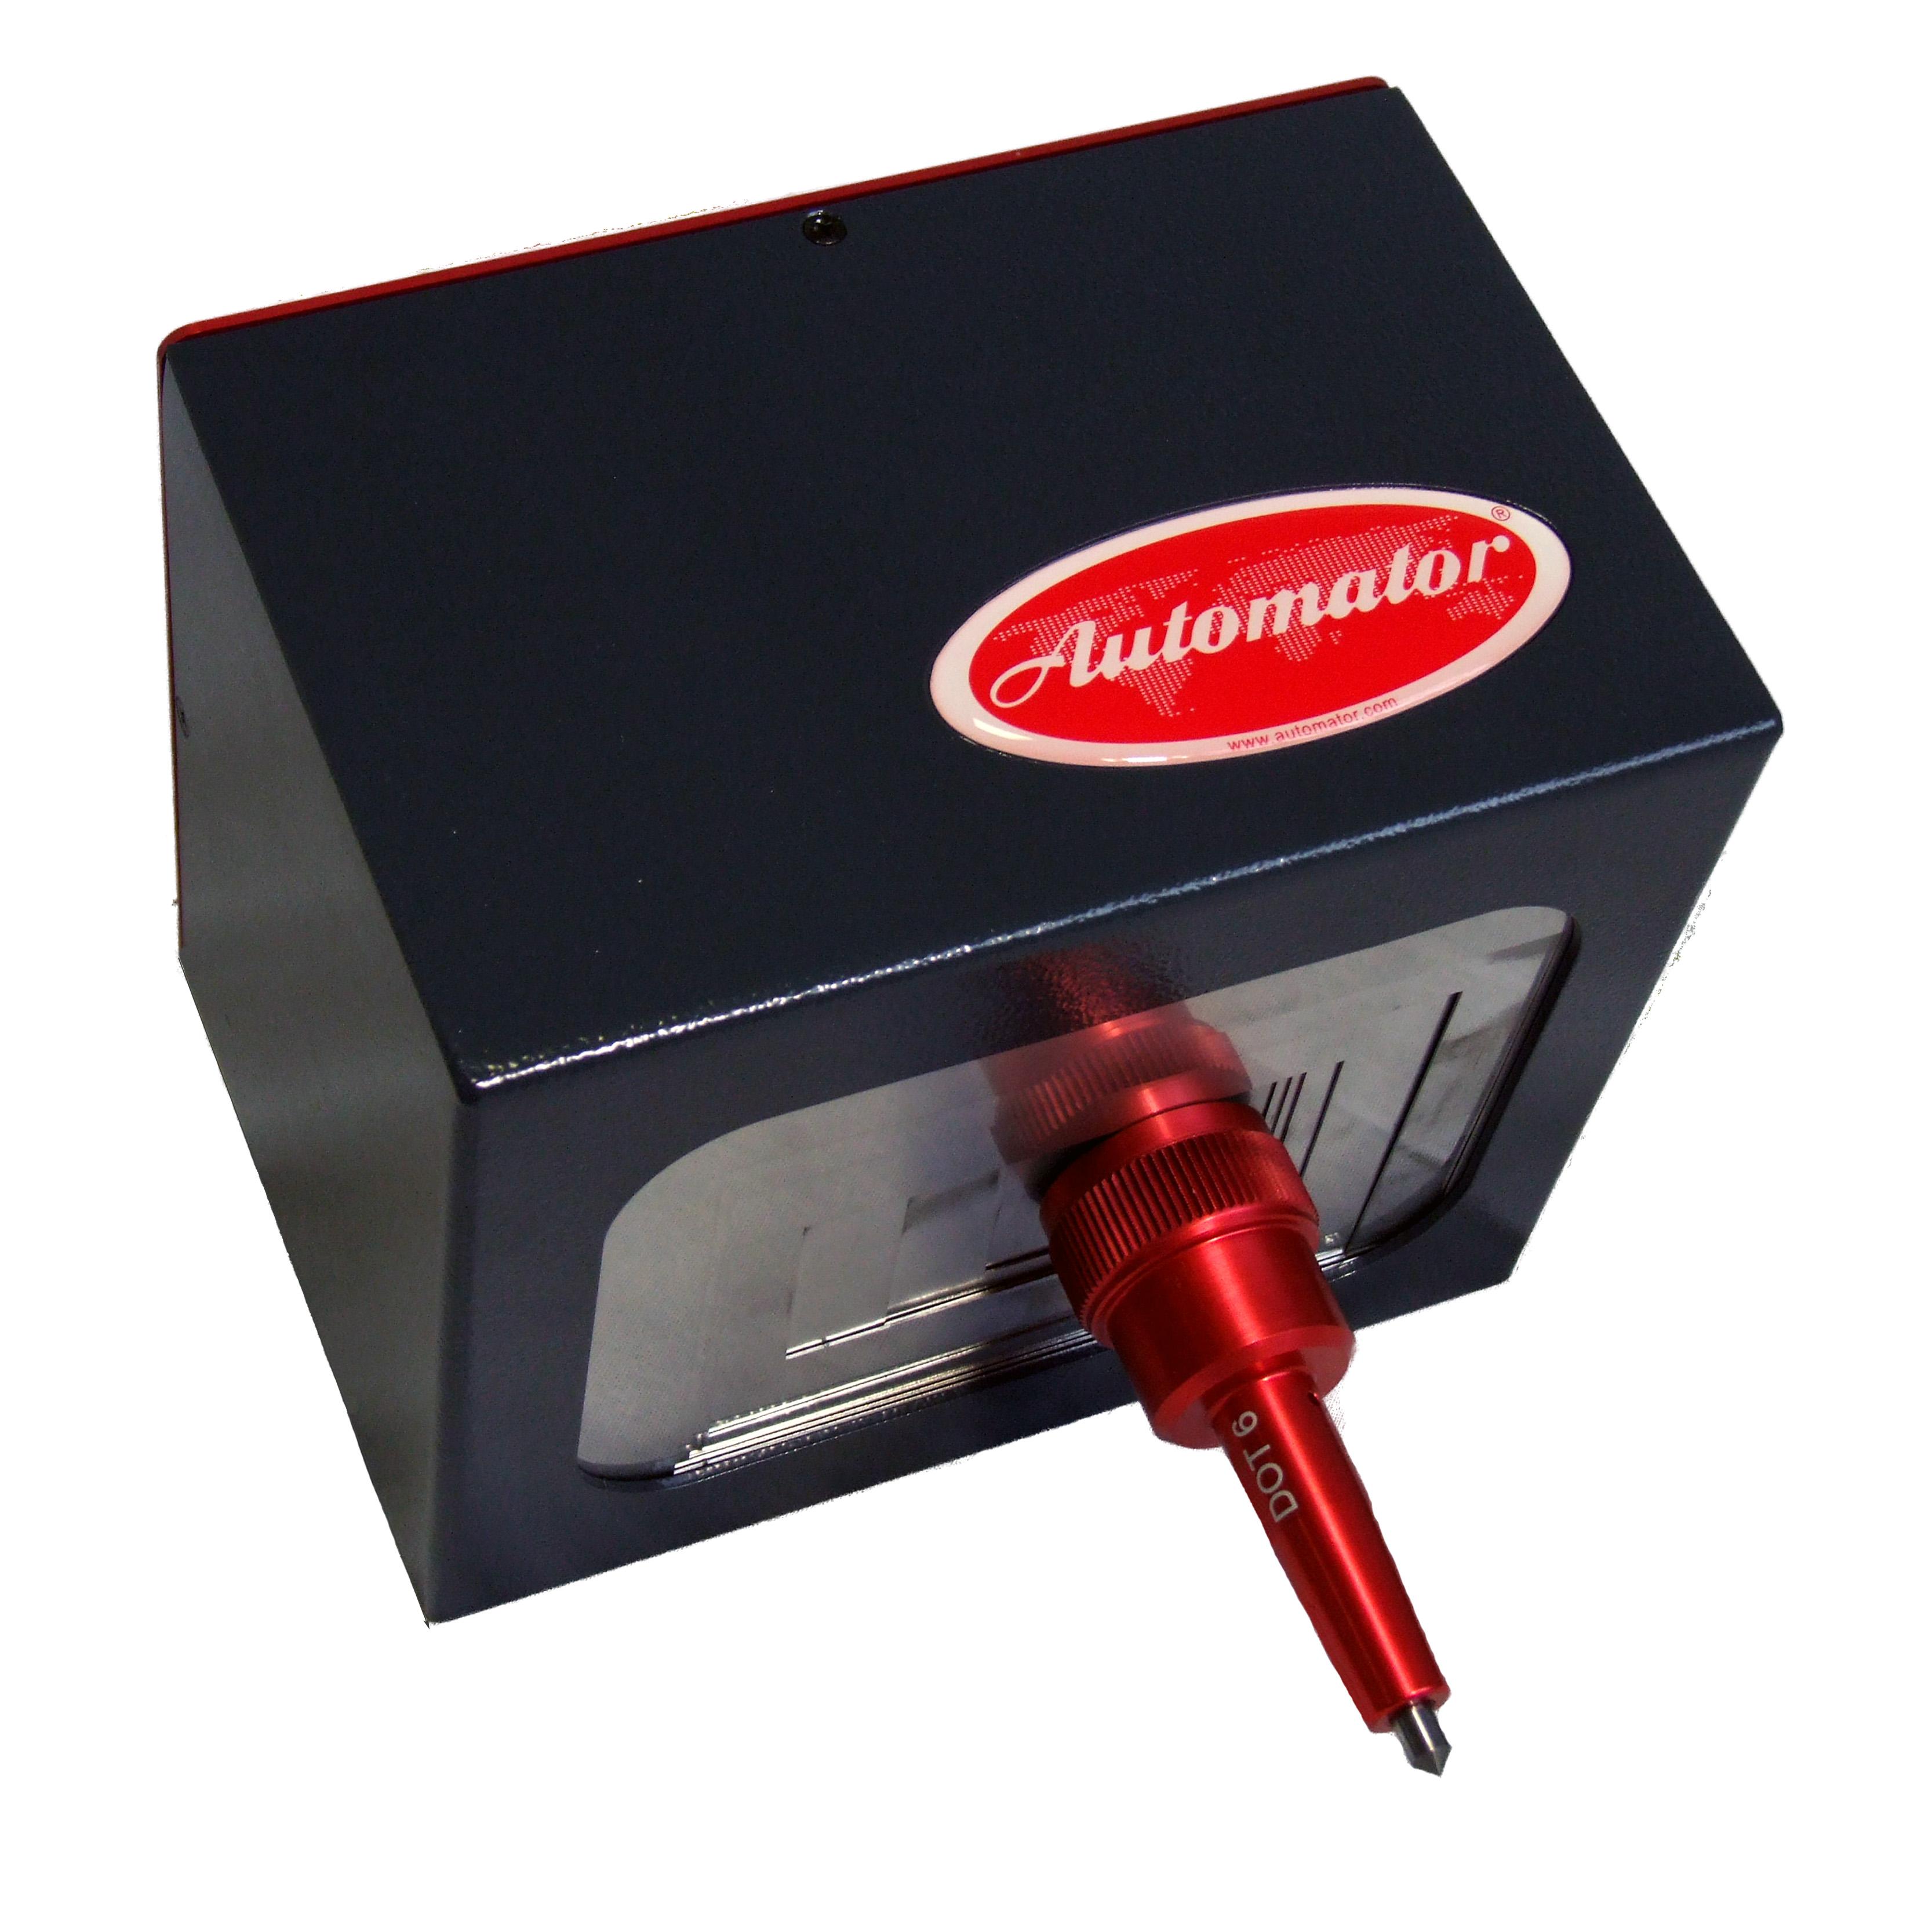 ADP 5090 Pneumatikus pontjelölő gép AC 500-as kontroll panellal (50x90 mm)